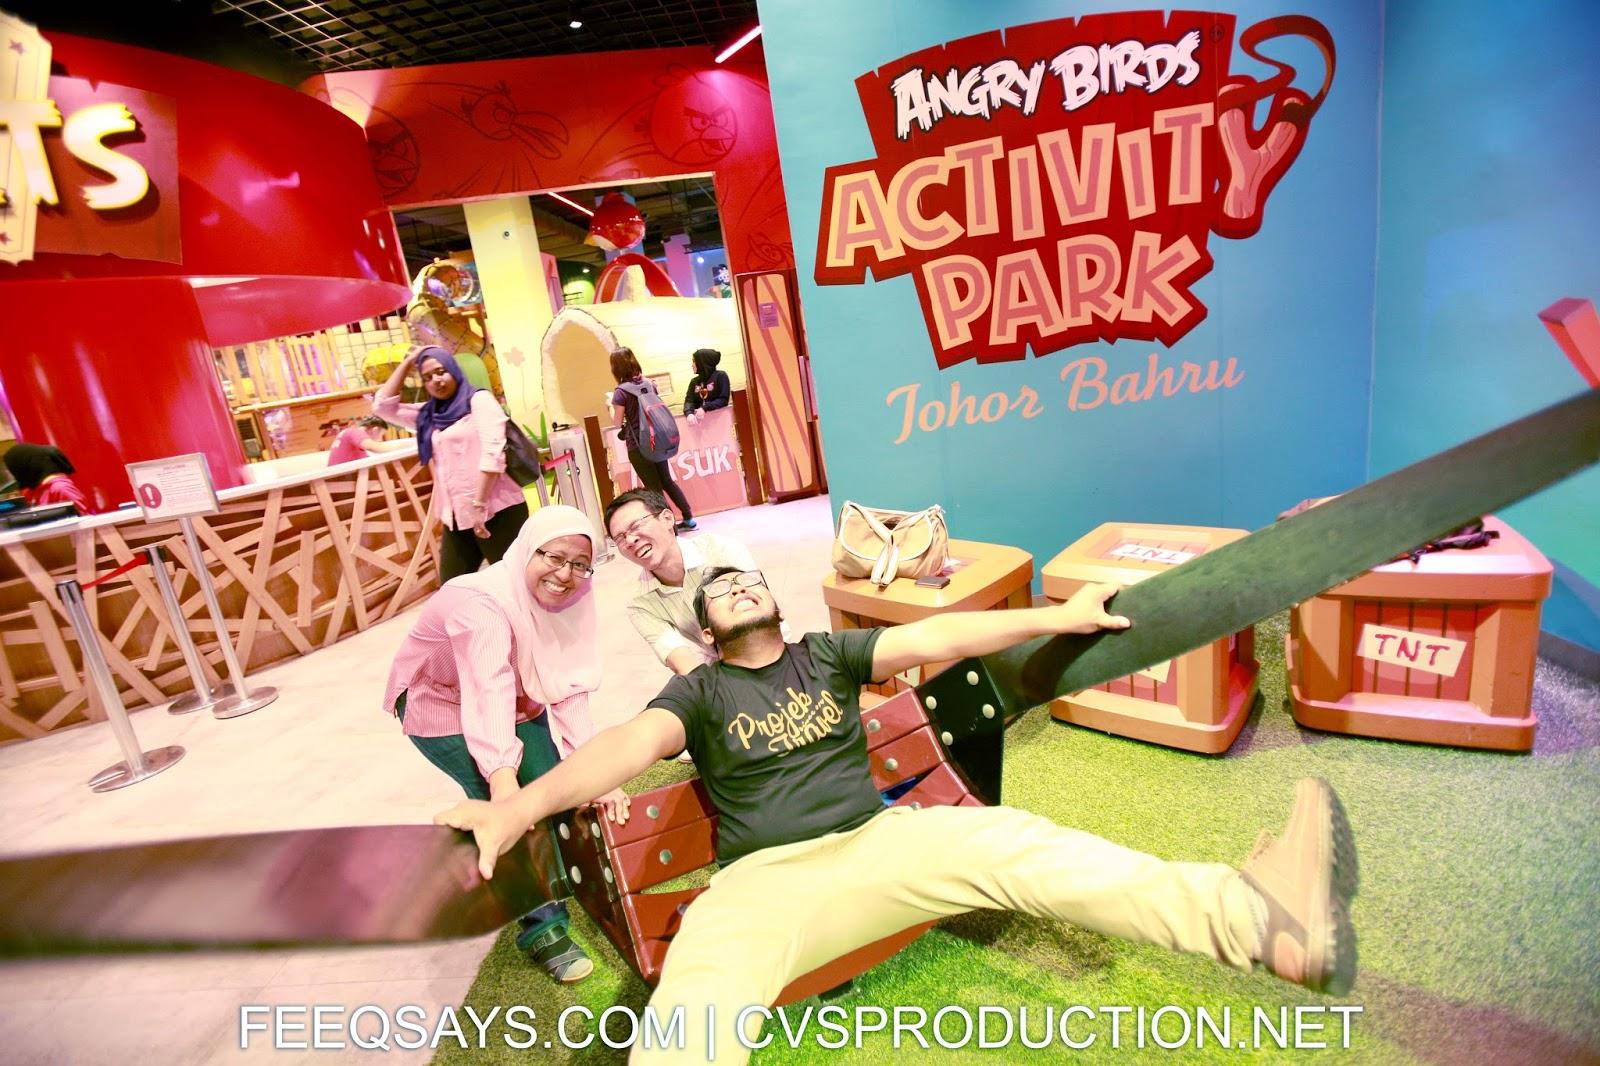 Angry Birds Activity Park Johor Bahru Malaysia indoor theme park